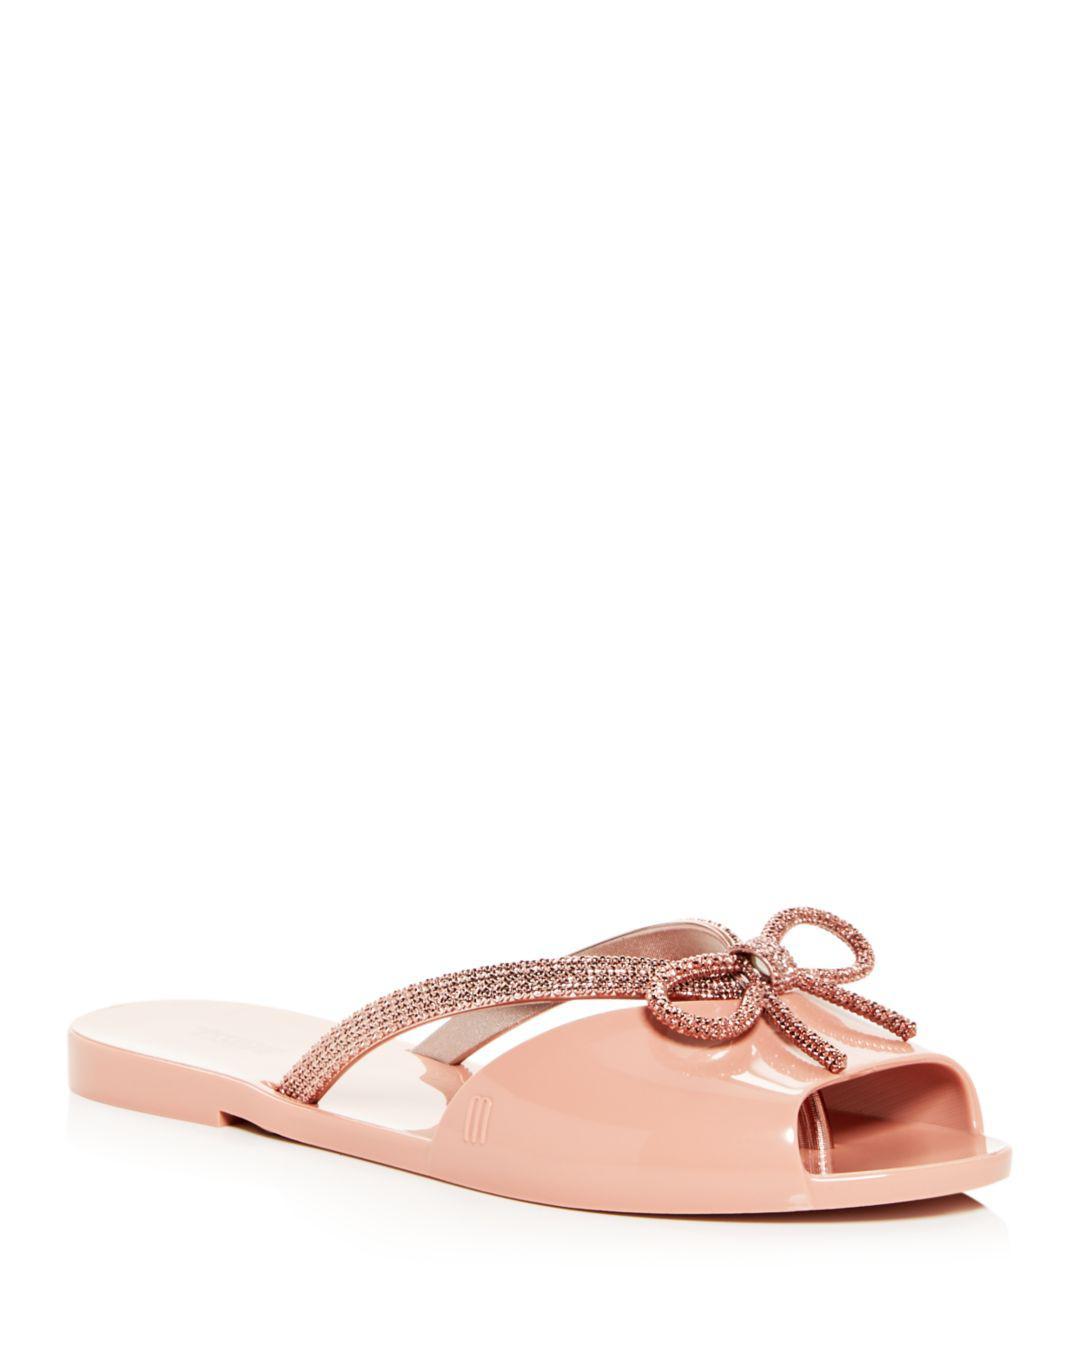 ce60f61ab37e39 Melissa Women s Ela Chrome Slide Sandals in Pink - Lyst